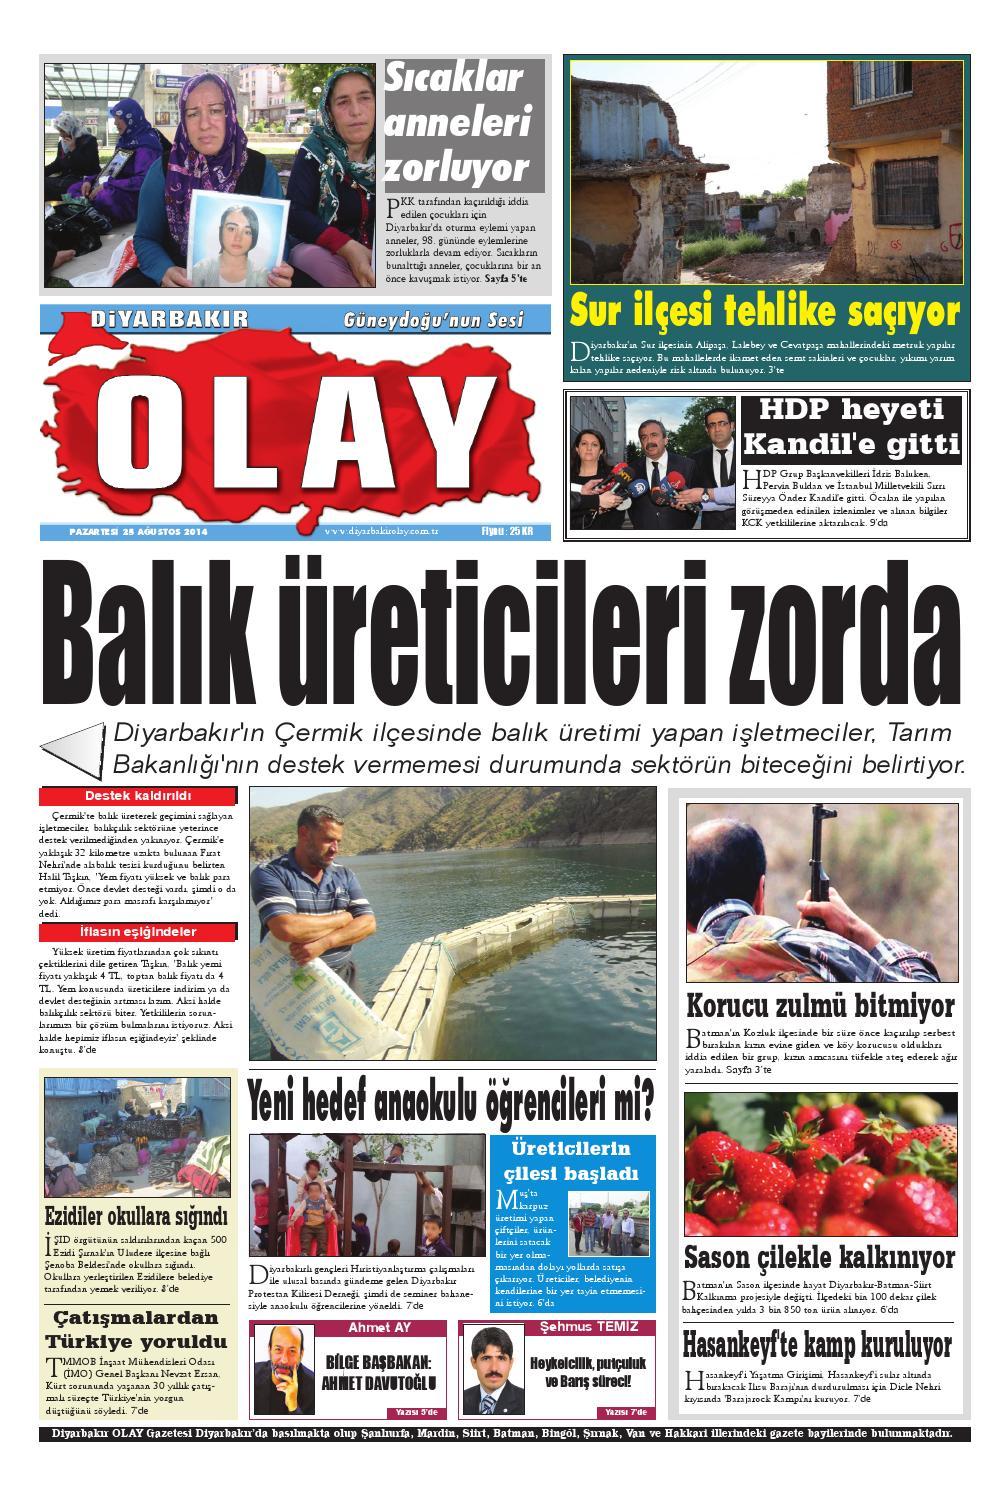 25 08 2014 Gazete Sayfalari By Diyarbakir Olaygazetesi Issuu